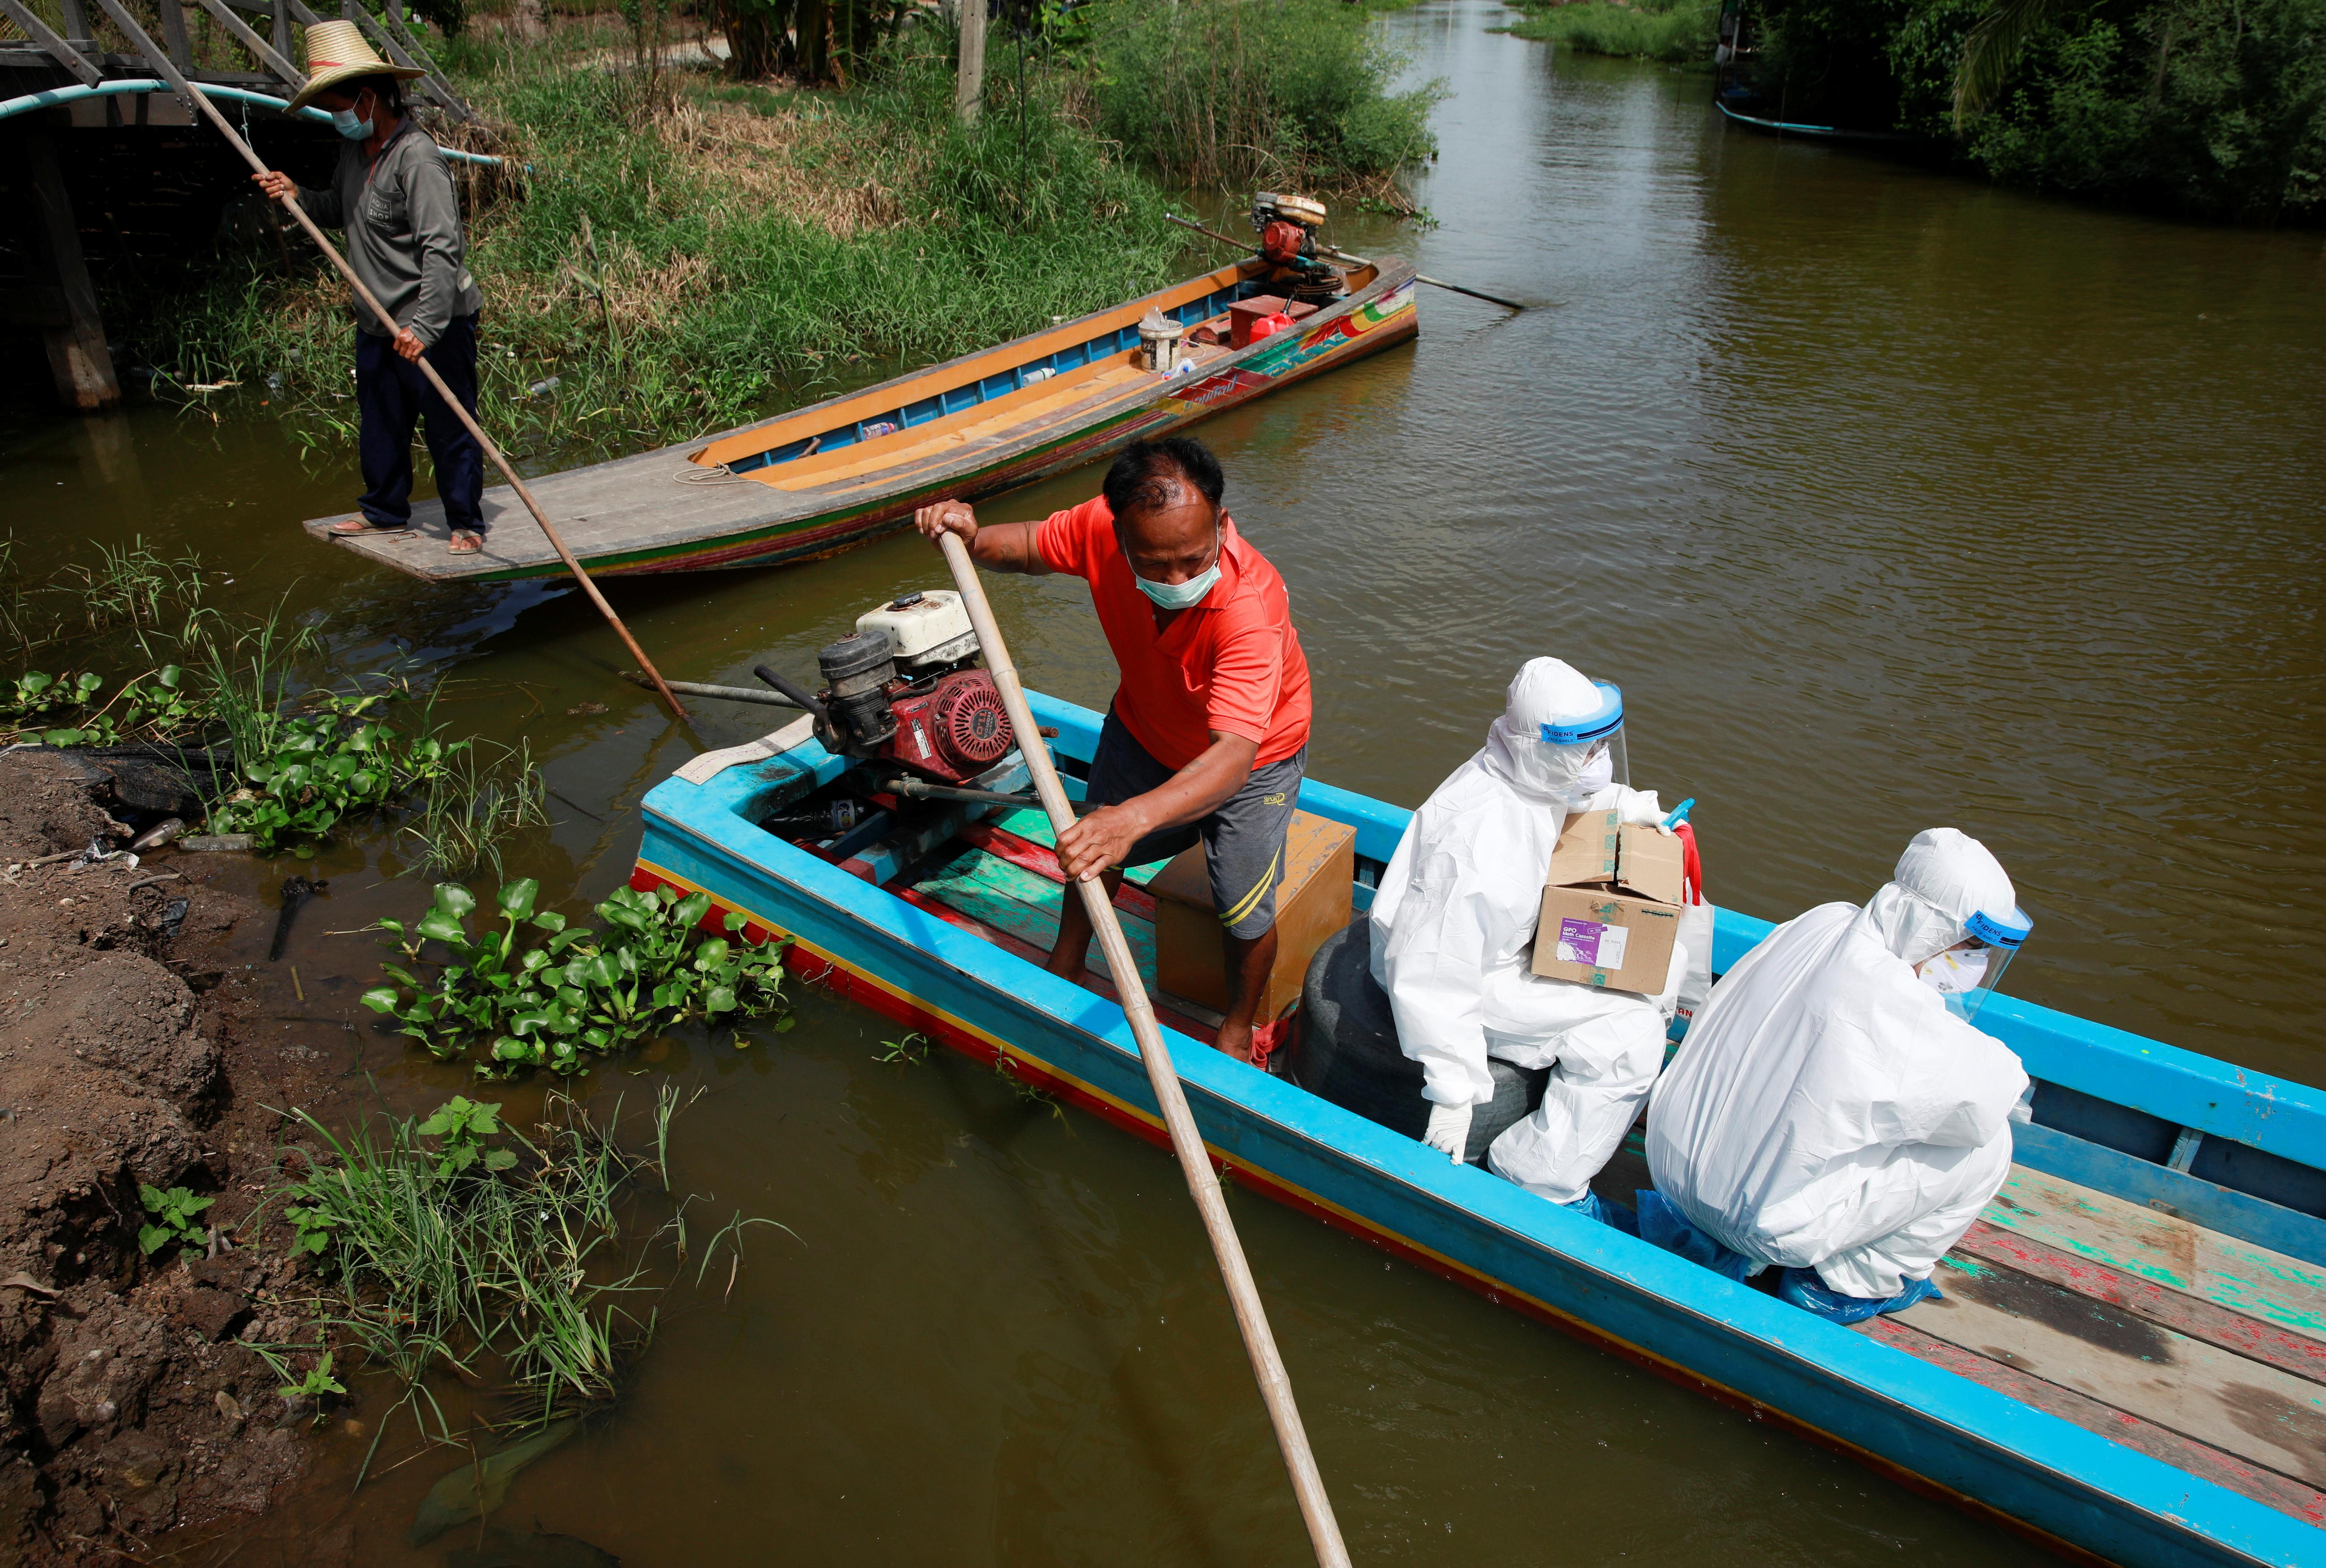 Public health officers Charoenrat Chaibut and Jurairat Tasom travel by boat to bring coronavirus disease (COVID-19) swab testing to residents living in remote communities, amid the rise of coronavirus disease infections, in Samut Prakan, near Bangkok, Thailand, July 19, 2021. REUTERS/Soe Zeya Tun